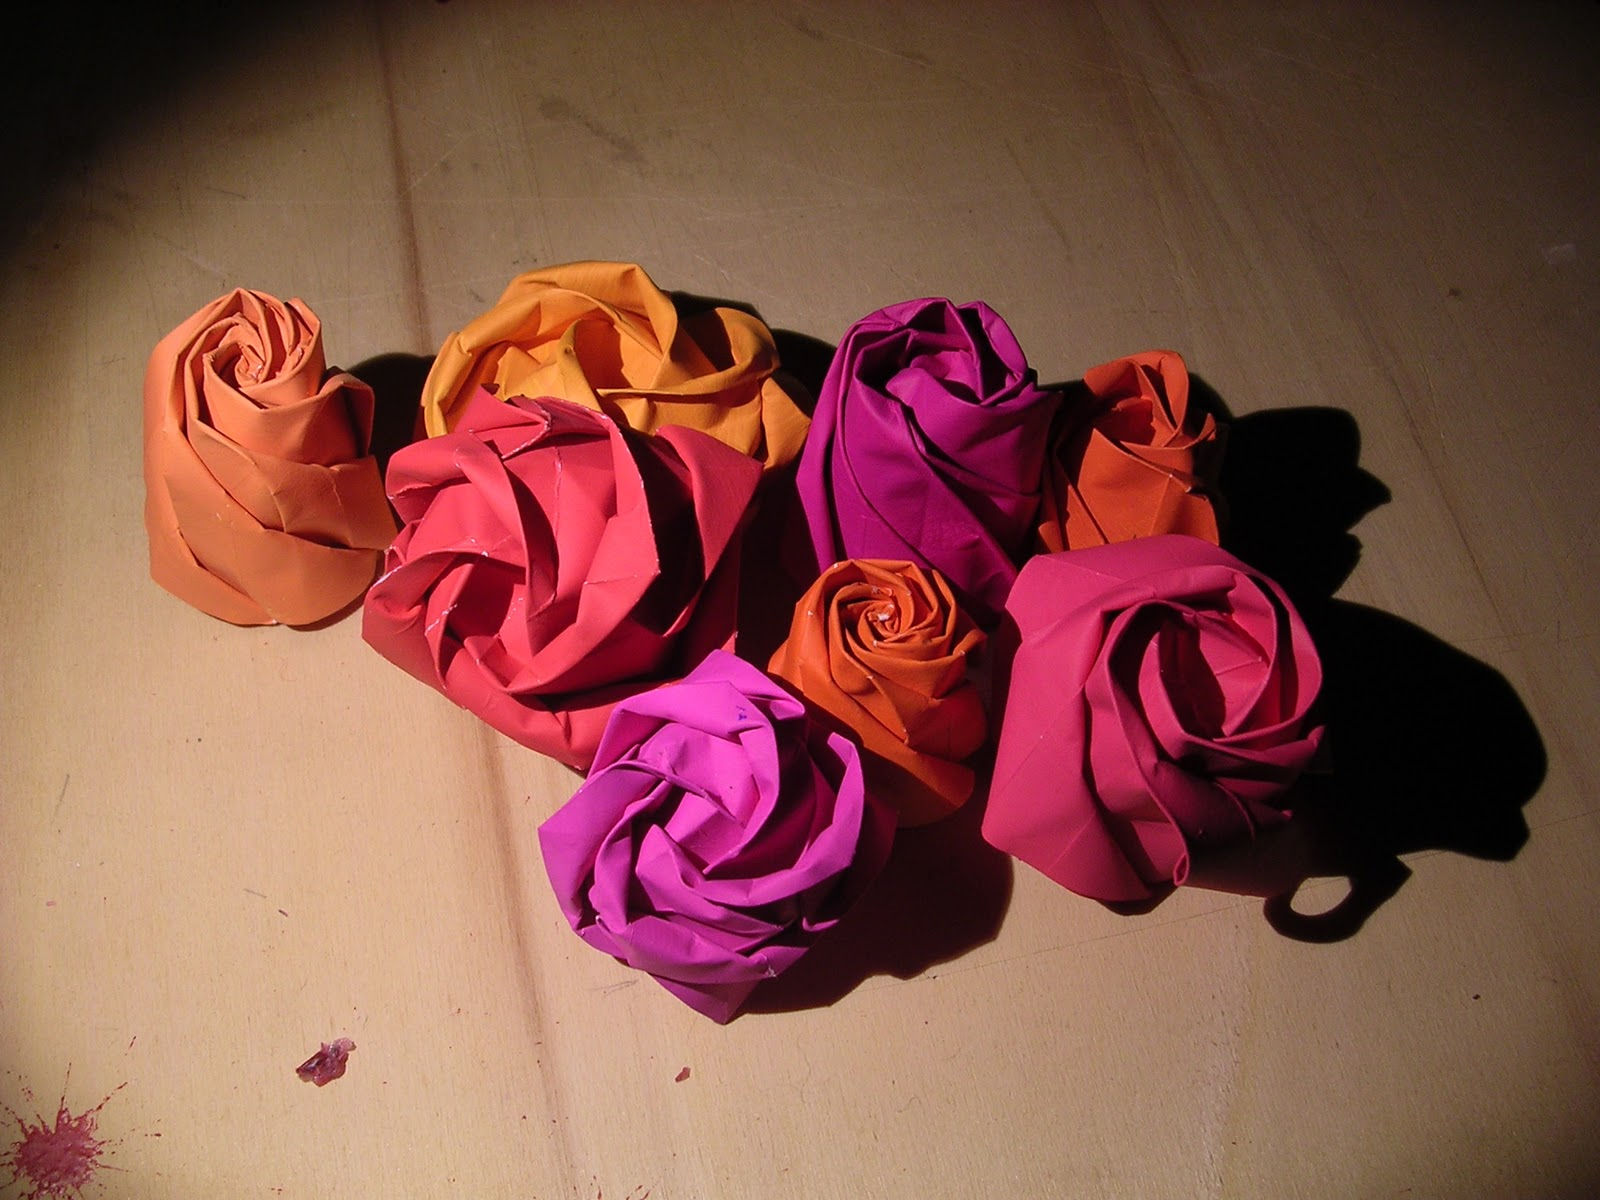 Shin han gyos origami rose box origami constructions origami rainbow roses how to make it httpbloom4everhowto origami rosep jeuxipadfo Choice Image